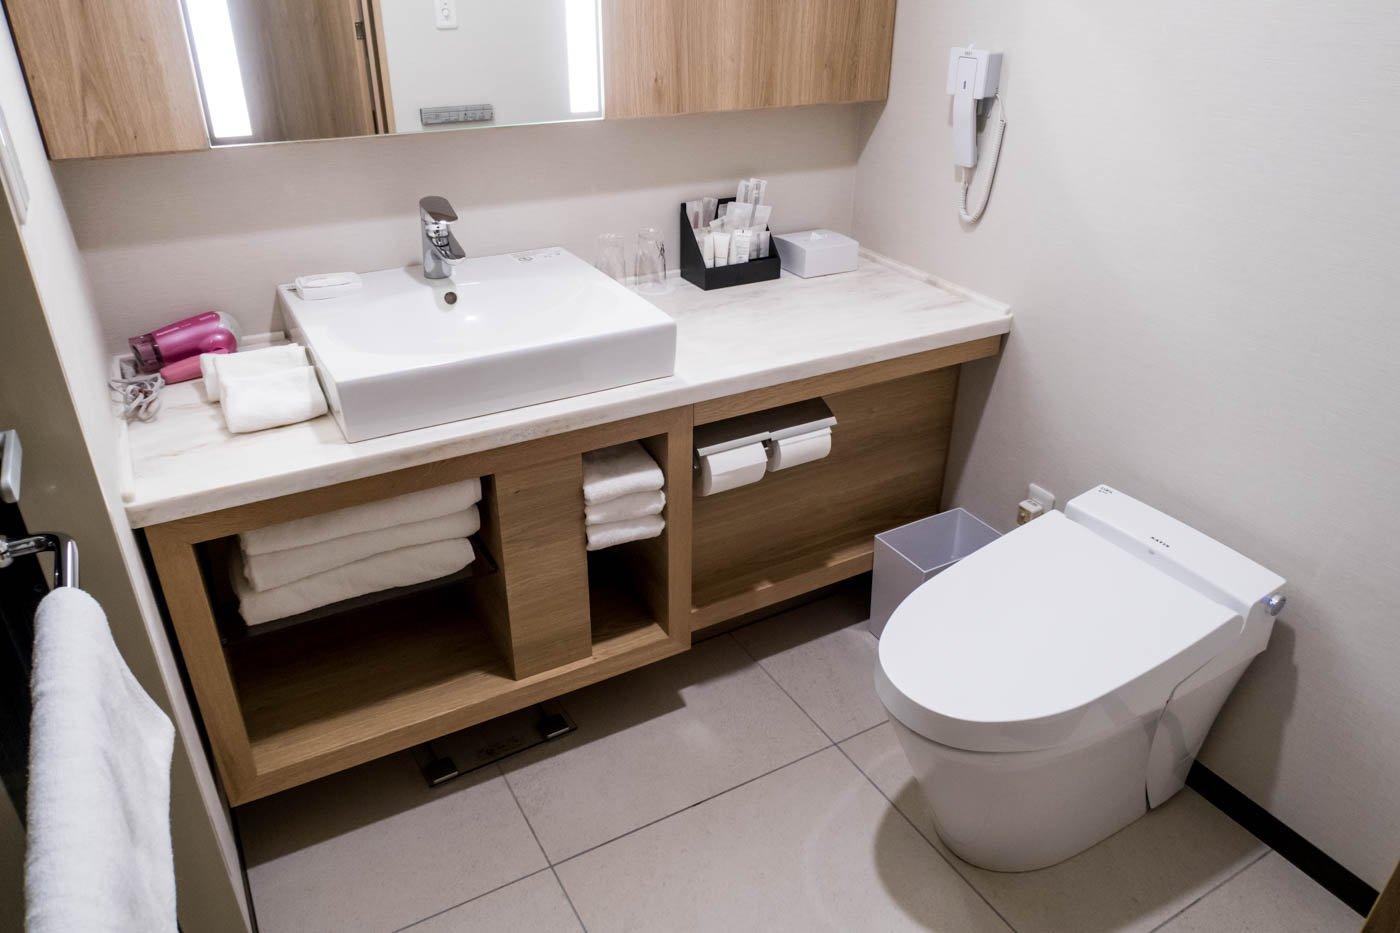 ANA Crowne Plaza Chitose Bathroom